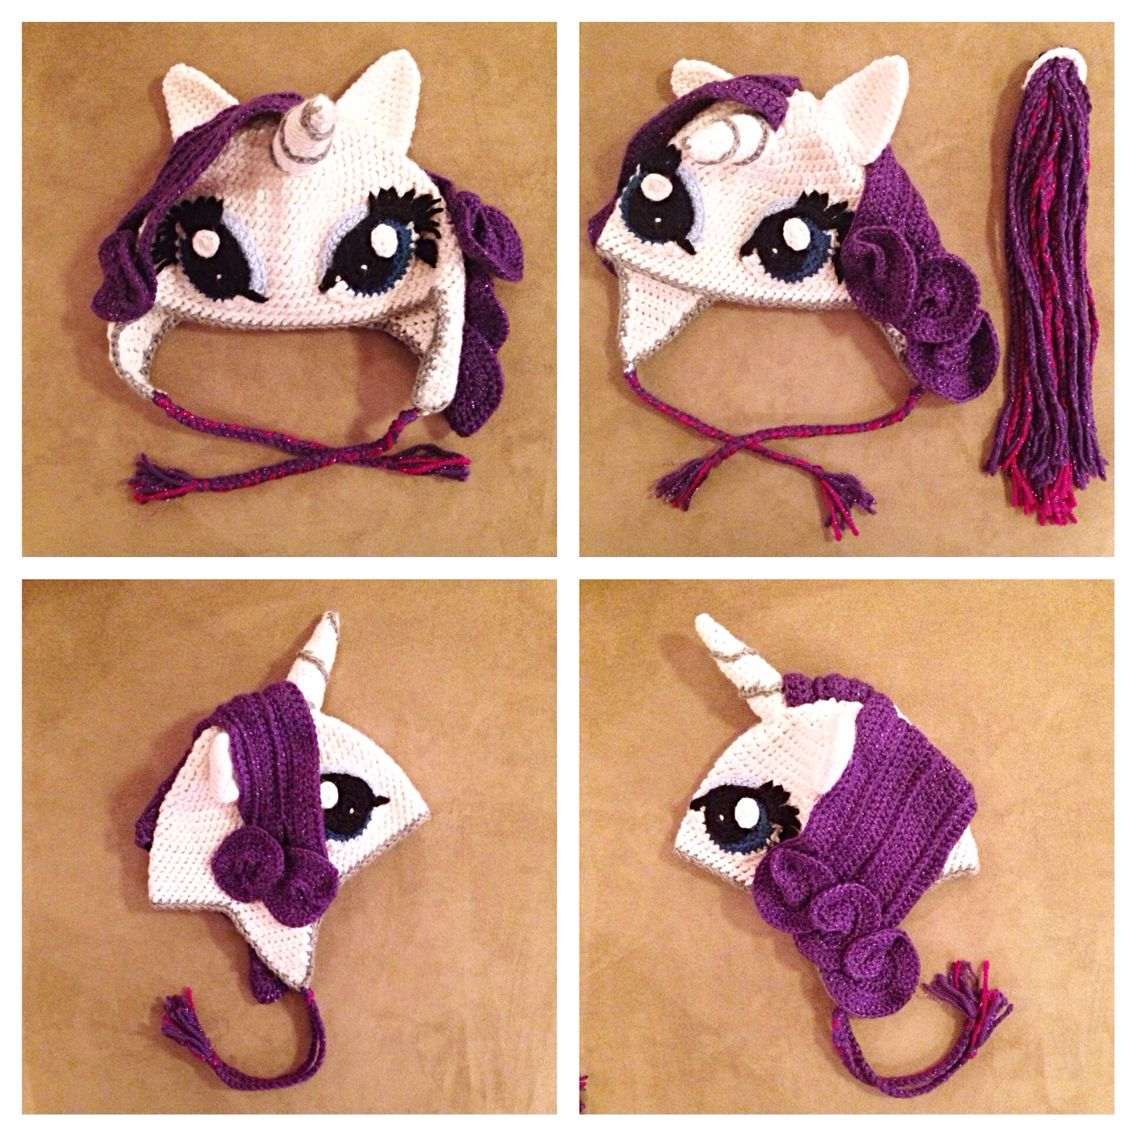 The finished product!!! My Little Pony Rarity Unicorn crochet ...